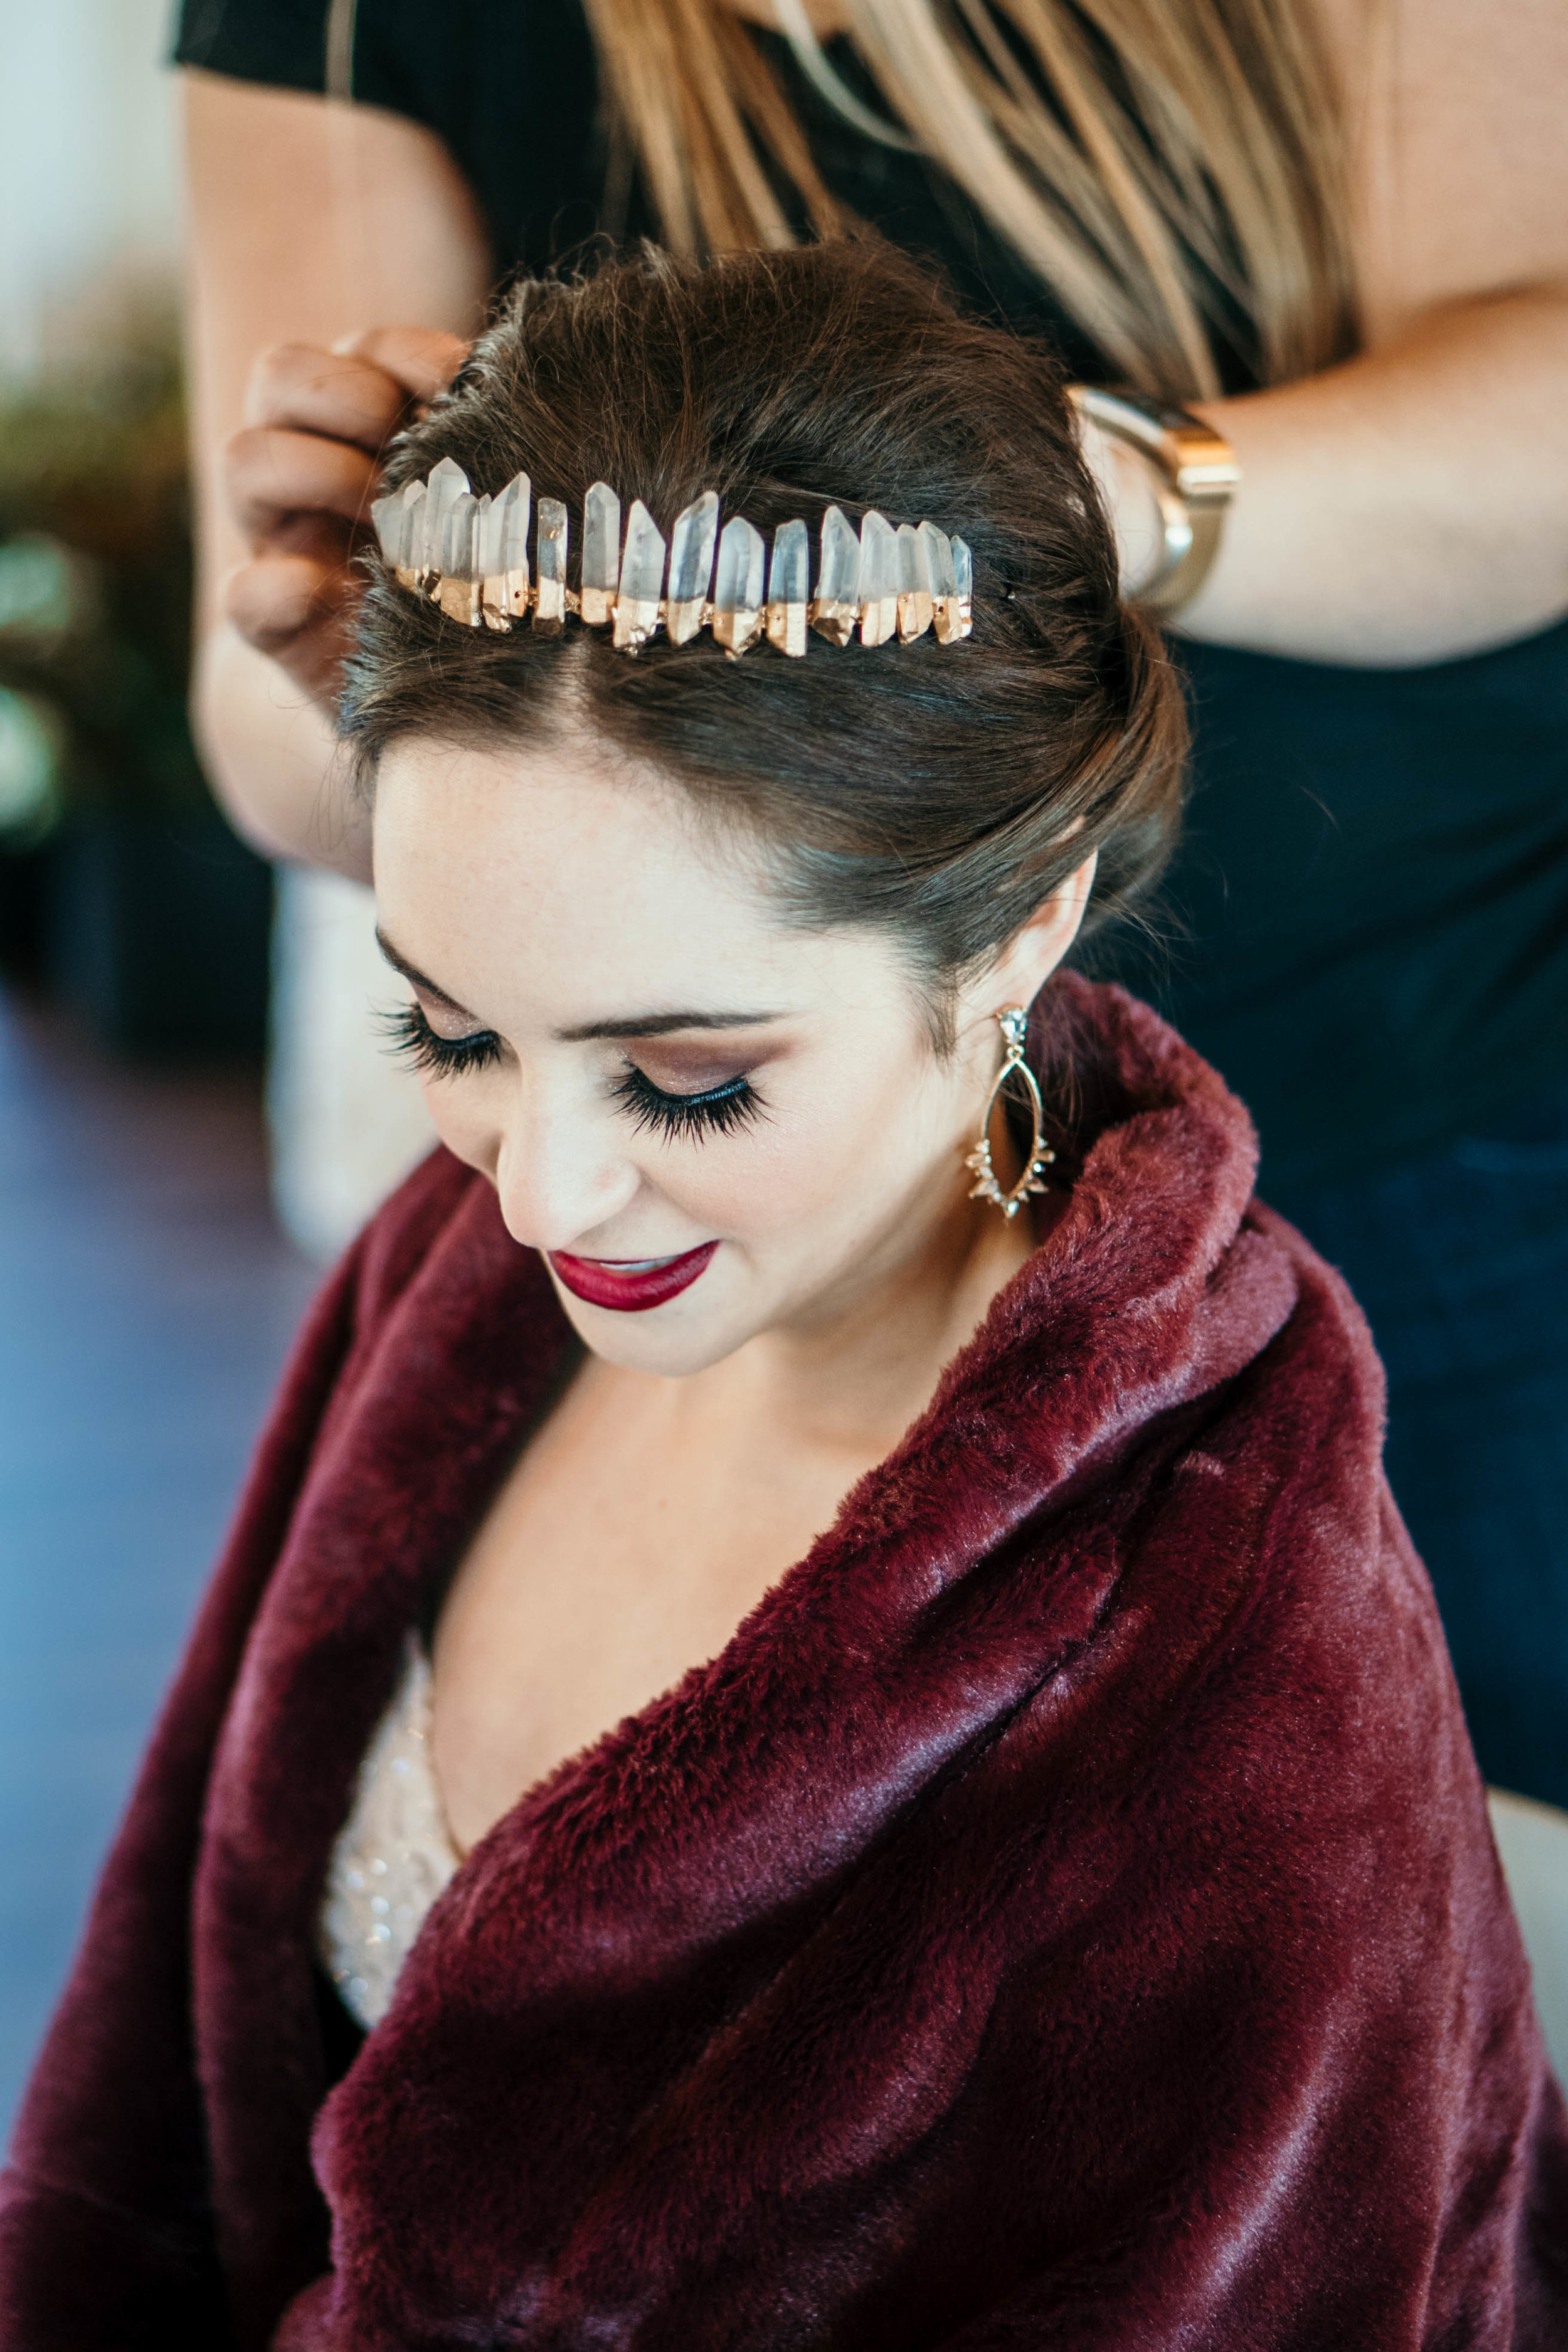 Austin Wedding Videographer - Dolls for Dolls (251 of 323).jpg